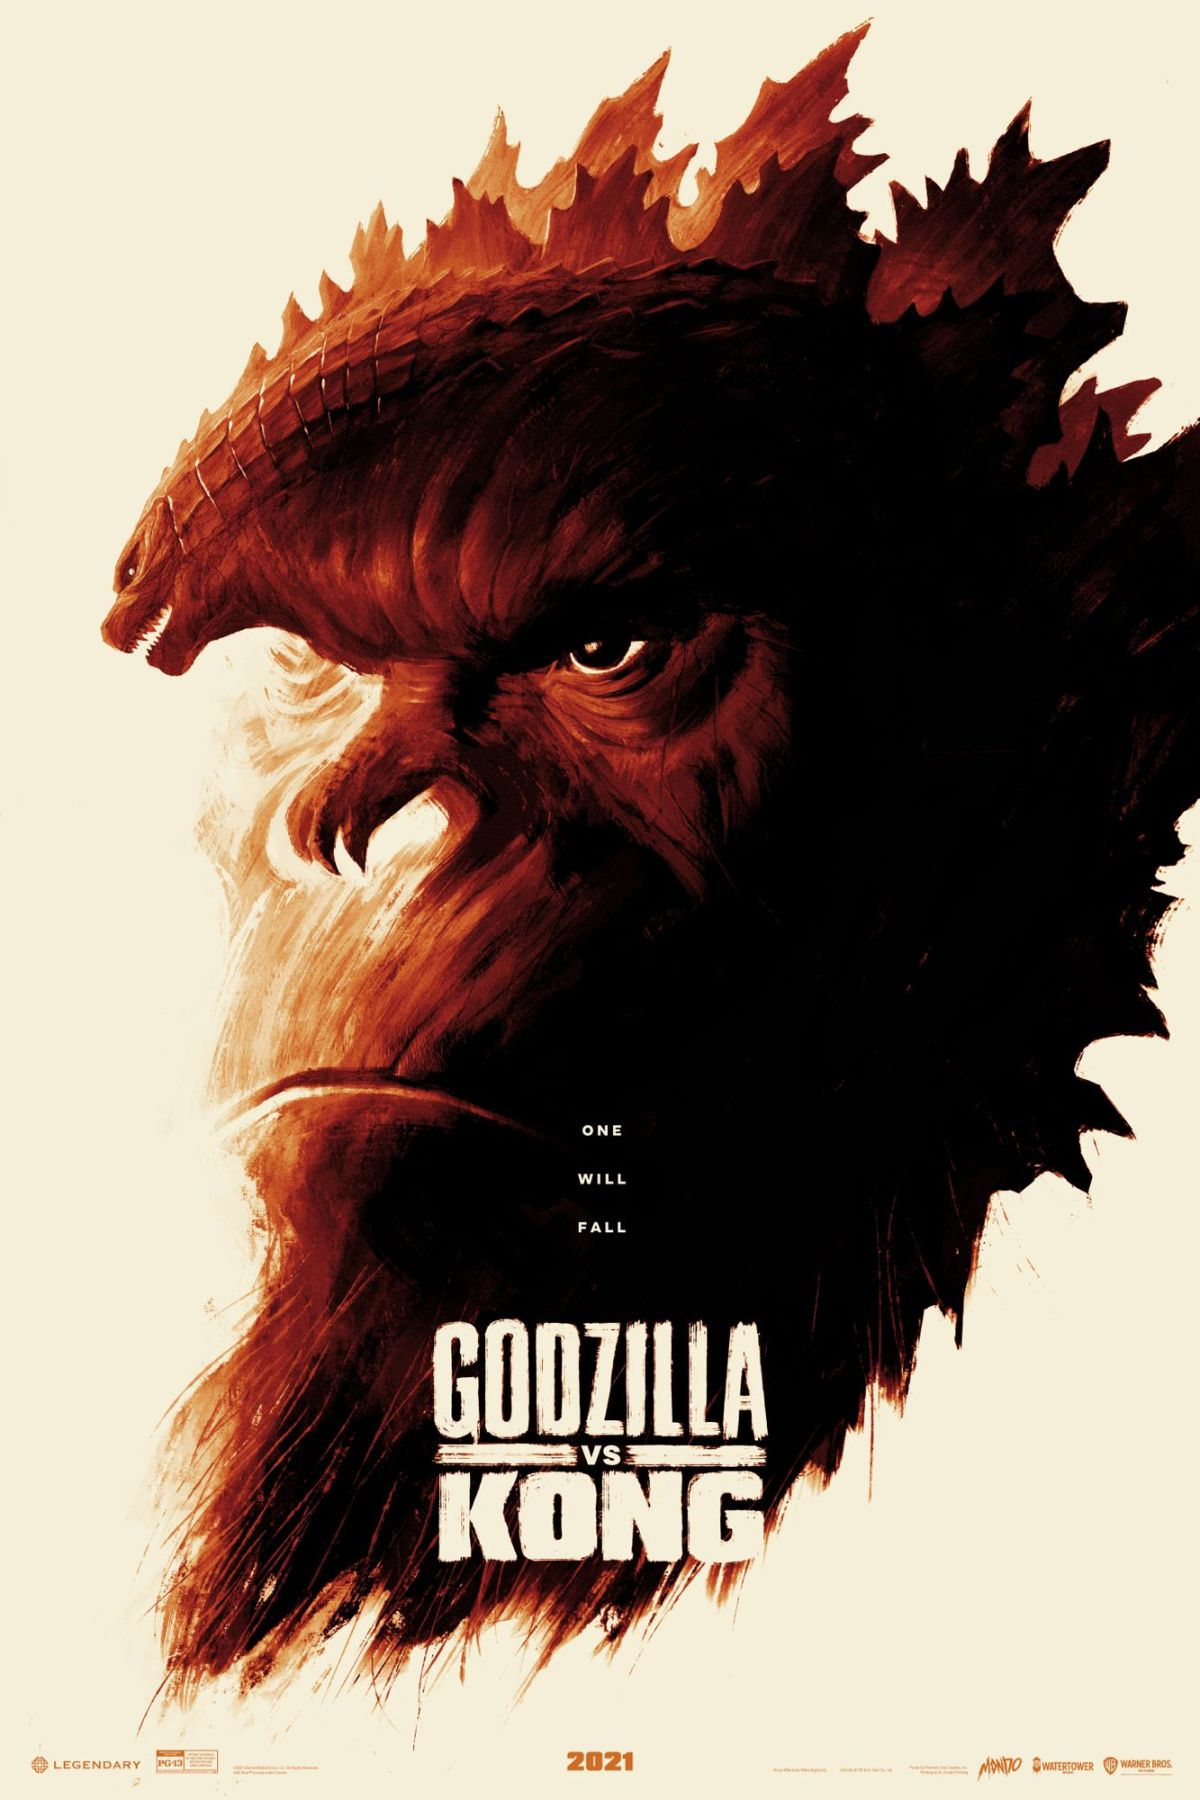 'Godzilla vs. Kong' showdown comes to Mondo with slick posters and tiki mugs